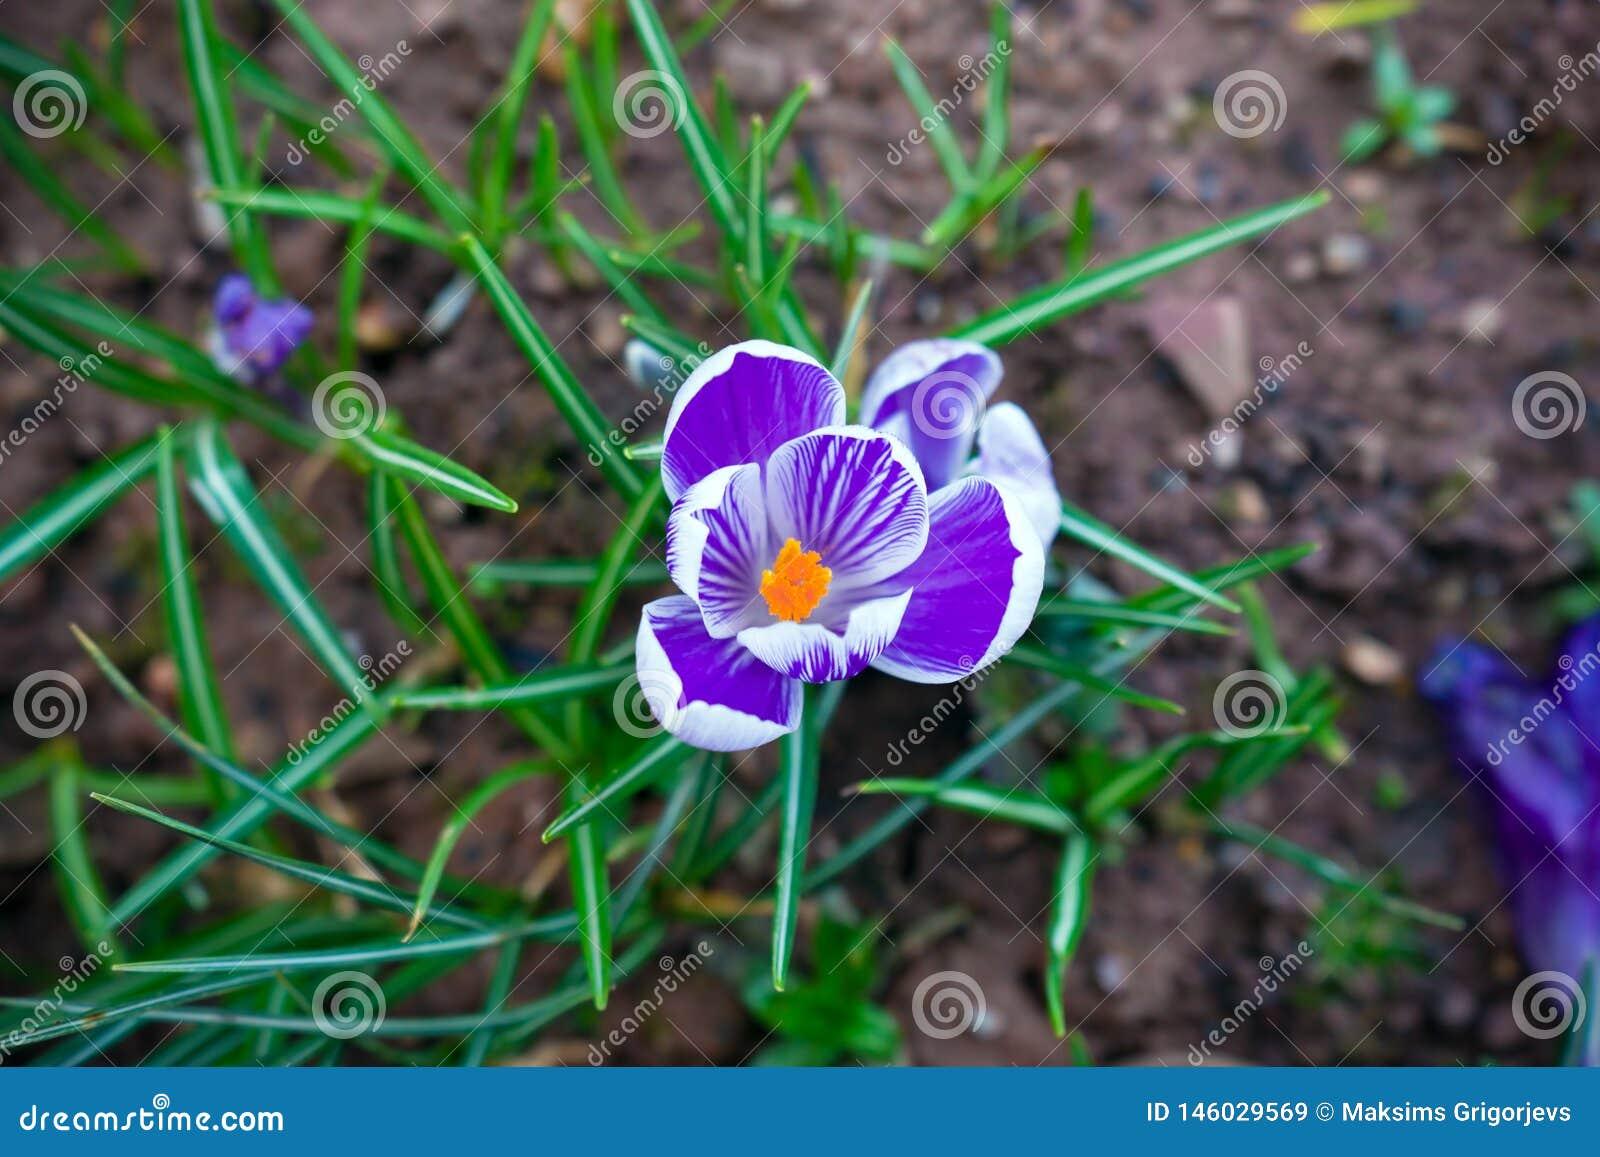 Purpere en witte krokusbloemen in de de lentetijd